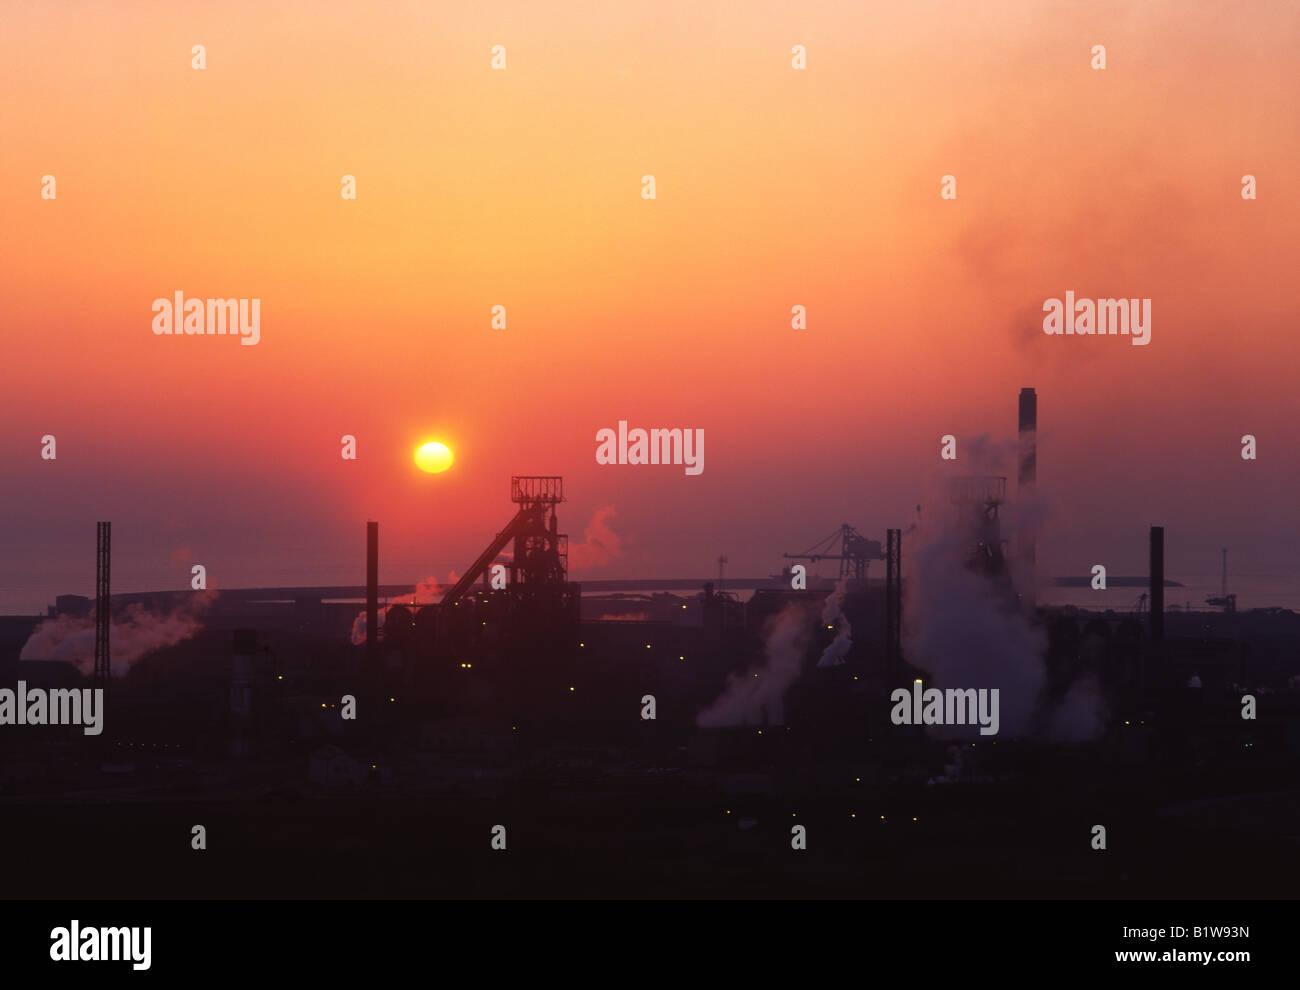 Tata Corus Margam Stahlwerk Port Talbot Hochöfen bei Sonnenuntergang Schwerindustrie South Wales UK Stockfoto